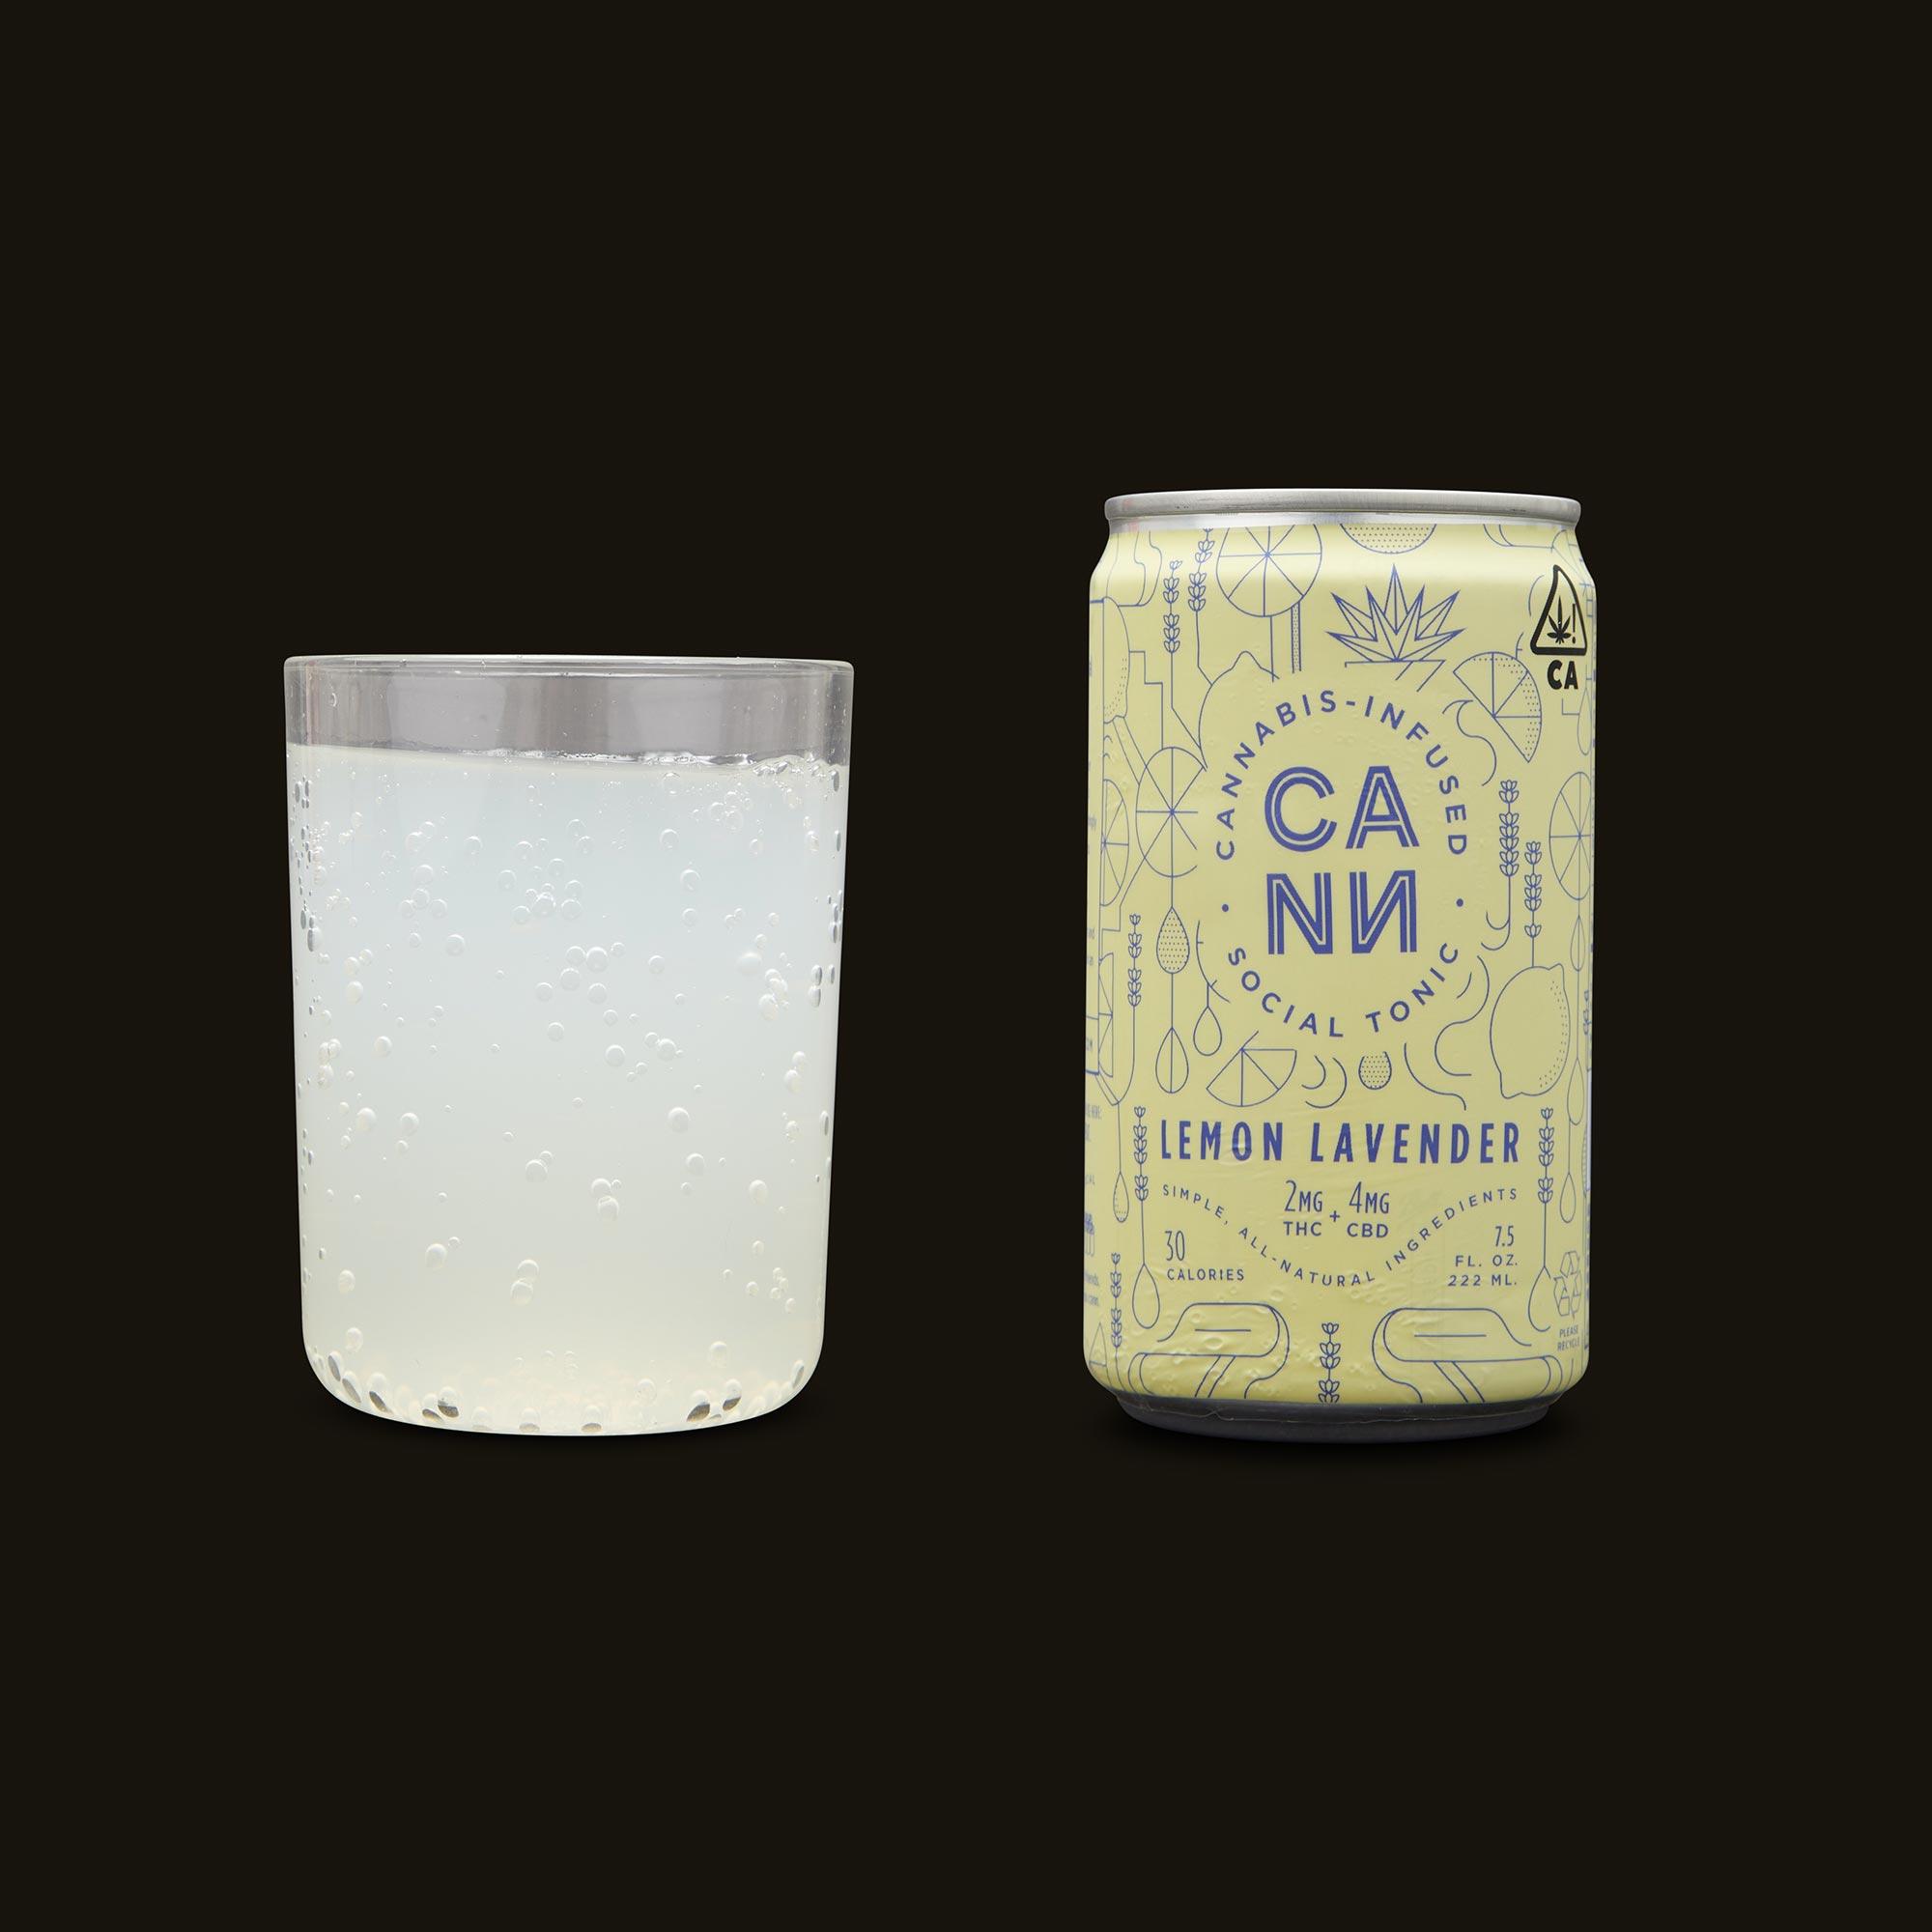 Cann Lemon Lavender Social Tonic